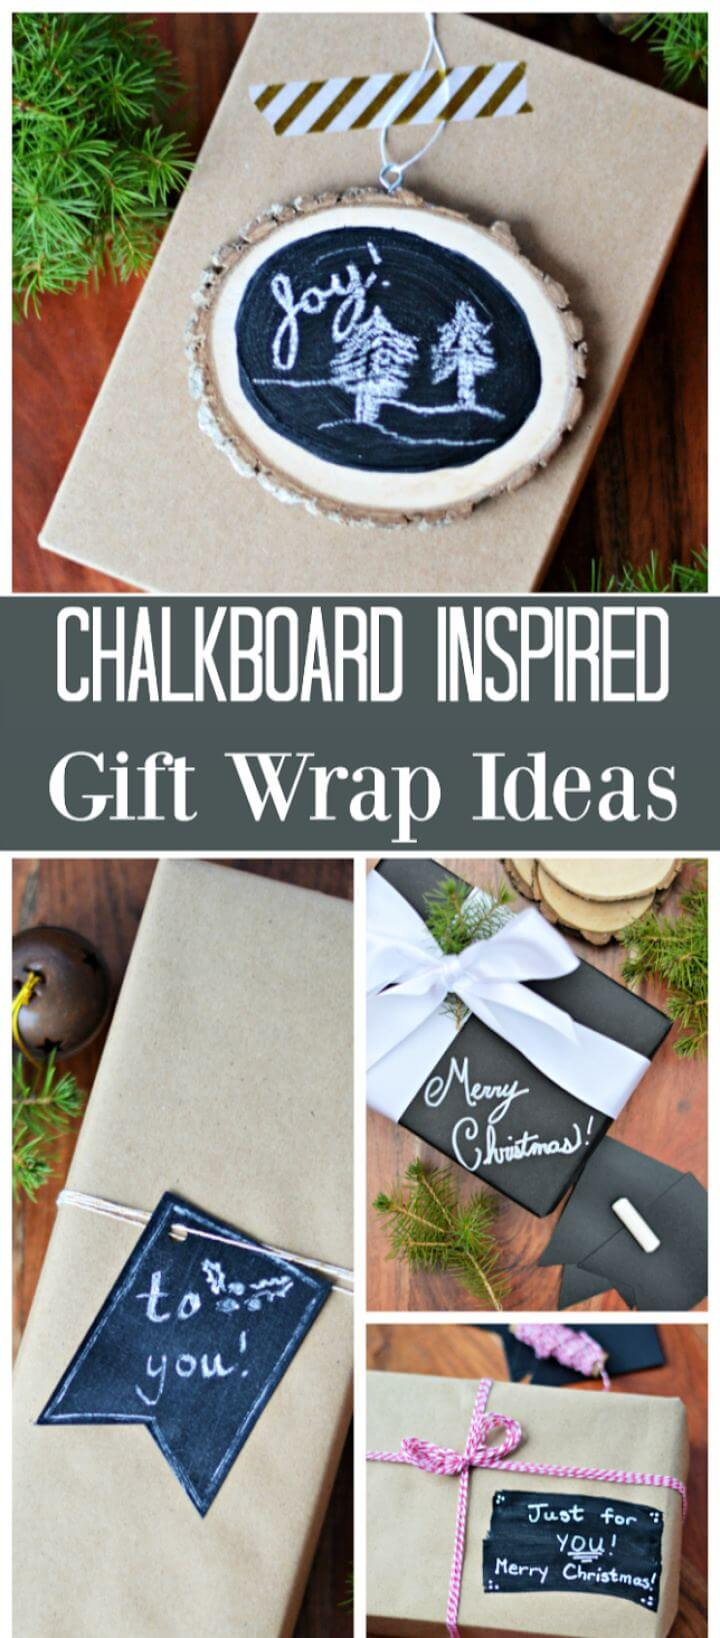 DIY 10 Minute Chalkboard Inspired Gift Wrap